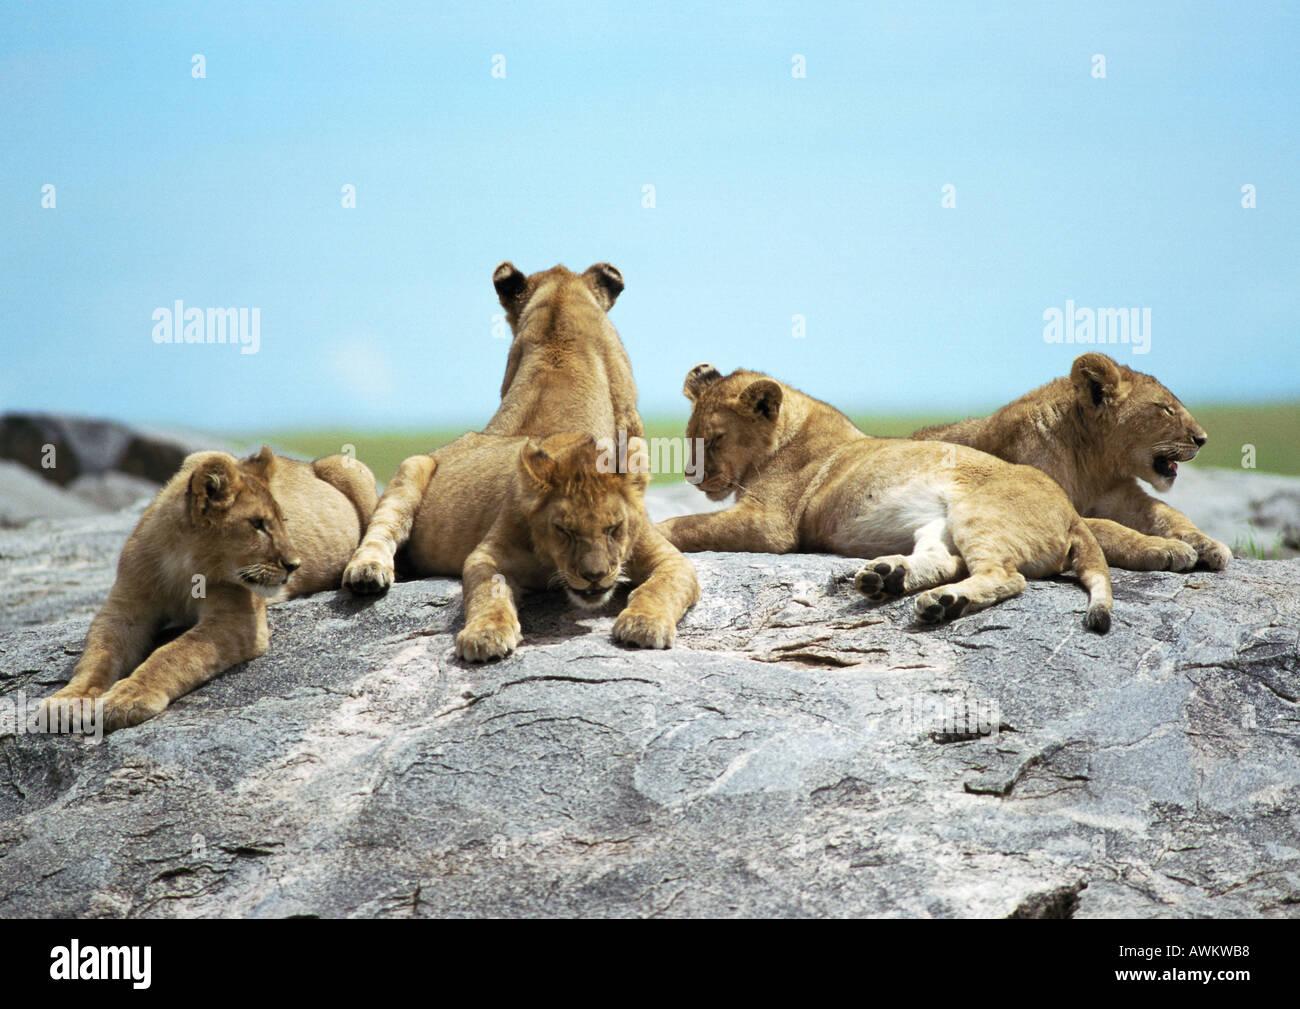 Lion cubs (Panthera leo) lying on rock - Stock Image